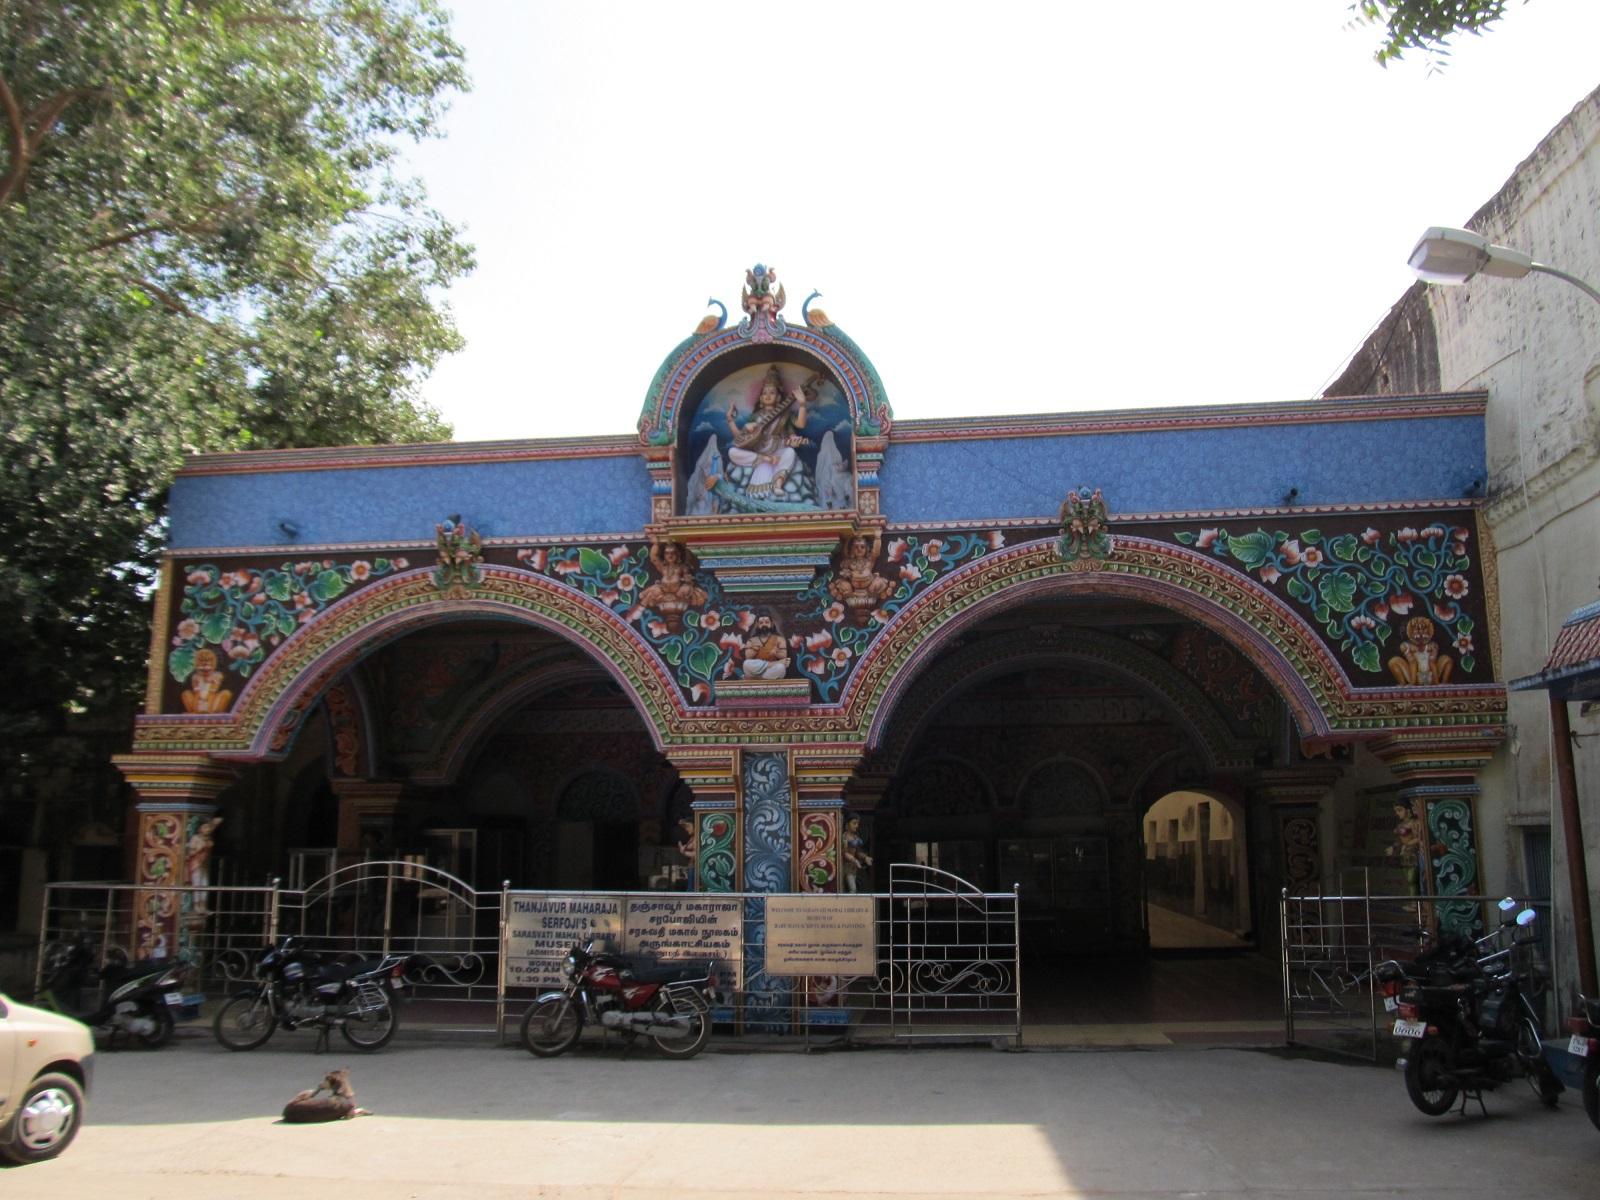 Tamilnadu Tourism Thanjavur Maratha Palace Saraswathi